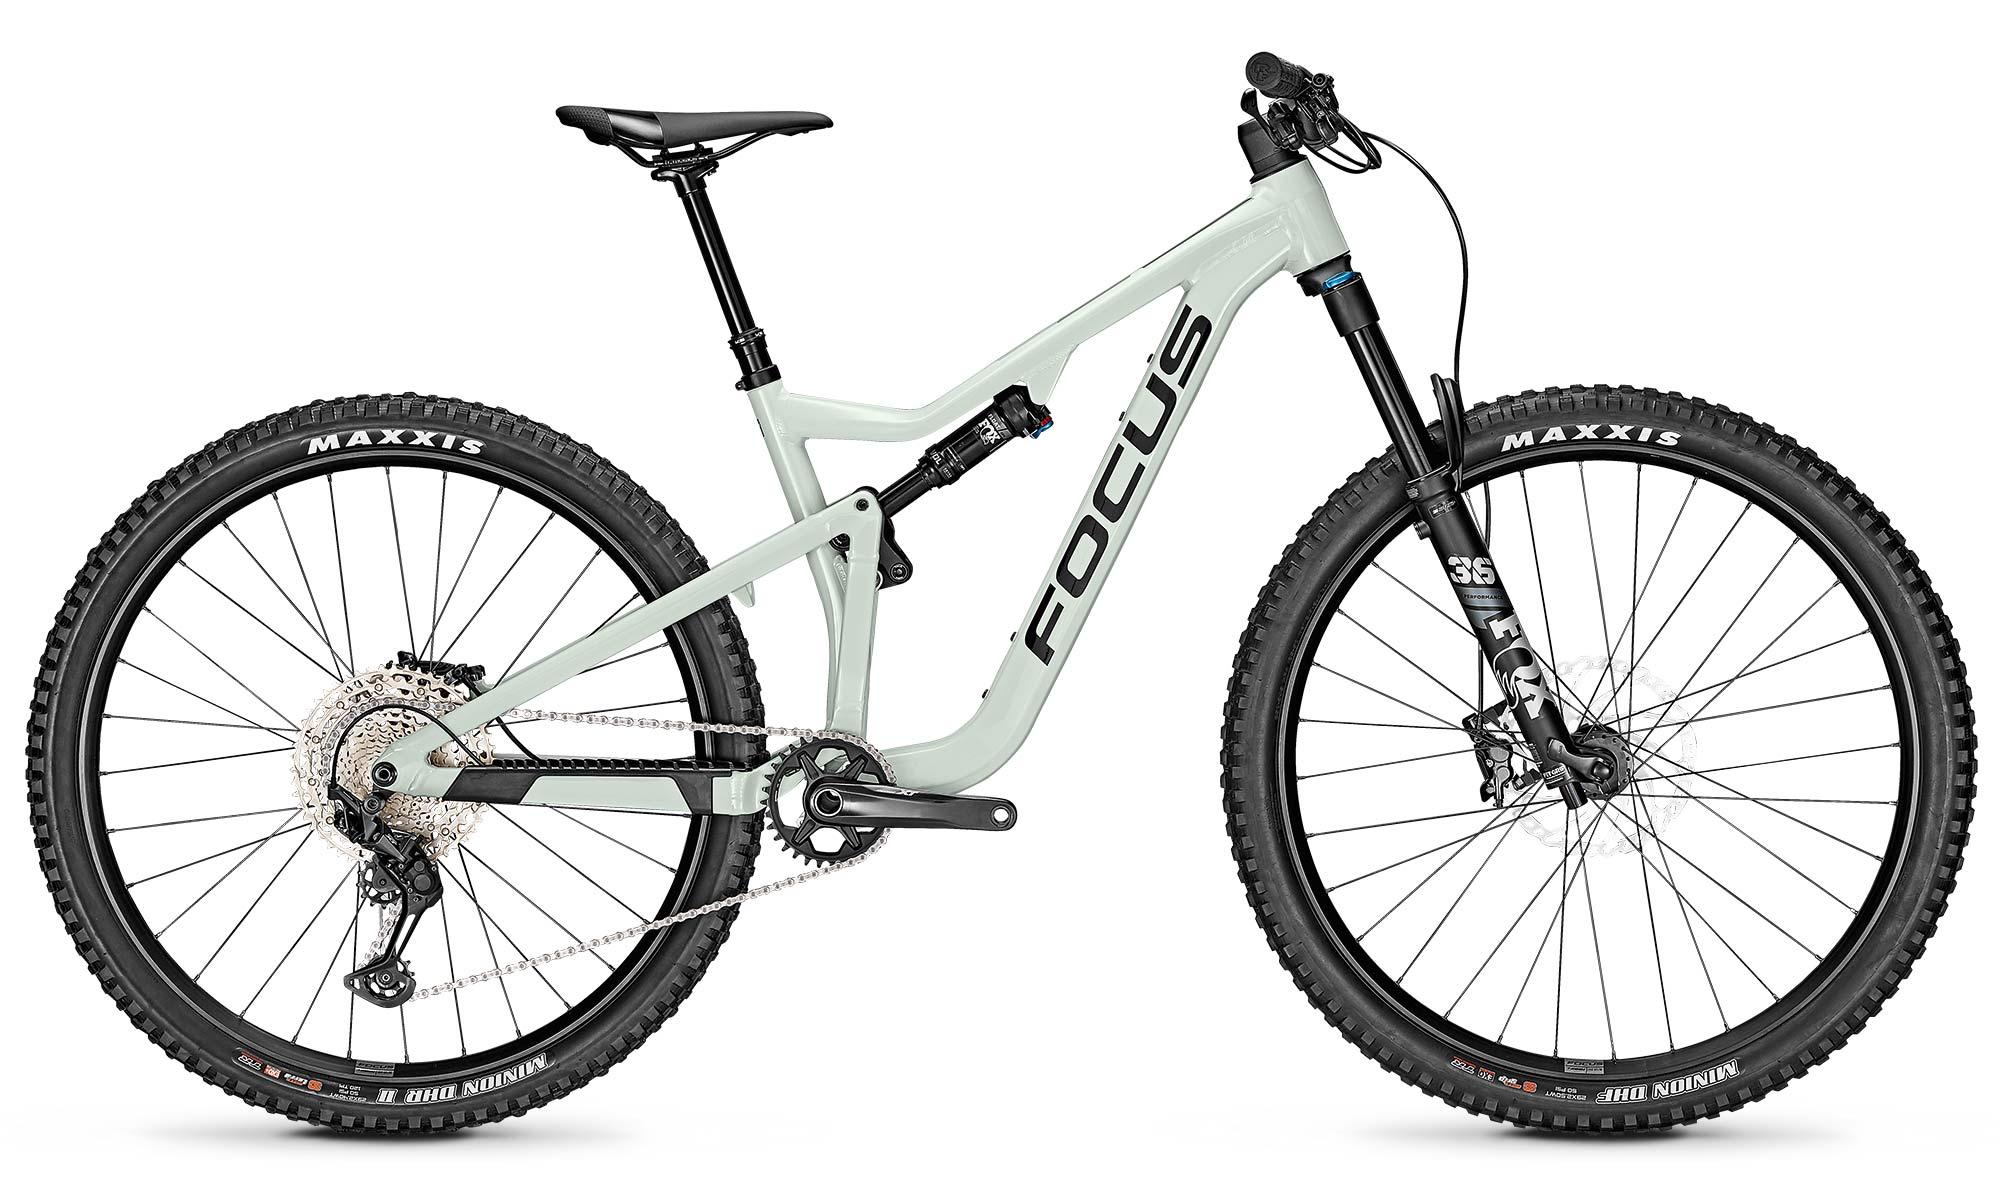 2021 Focus JAM affordable alloy 150mm 29er trail MTB all-mountain bike,6.9 complete